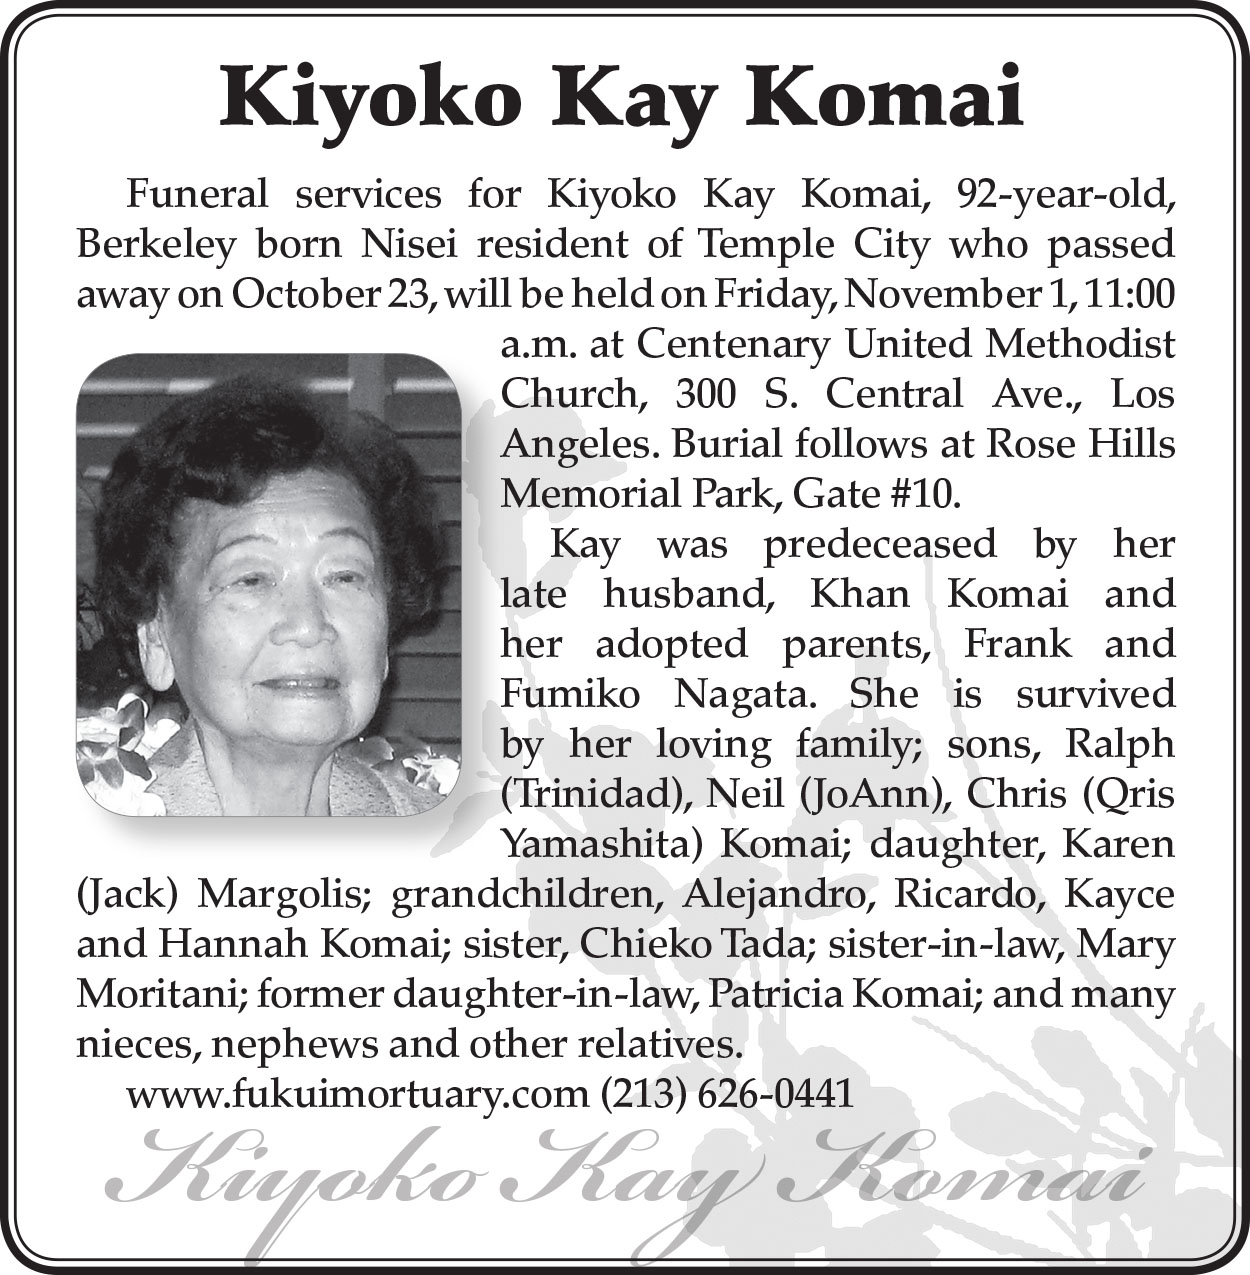 kiyoko_kay_komai